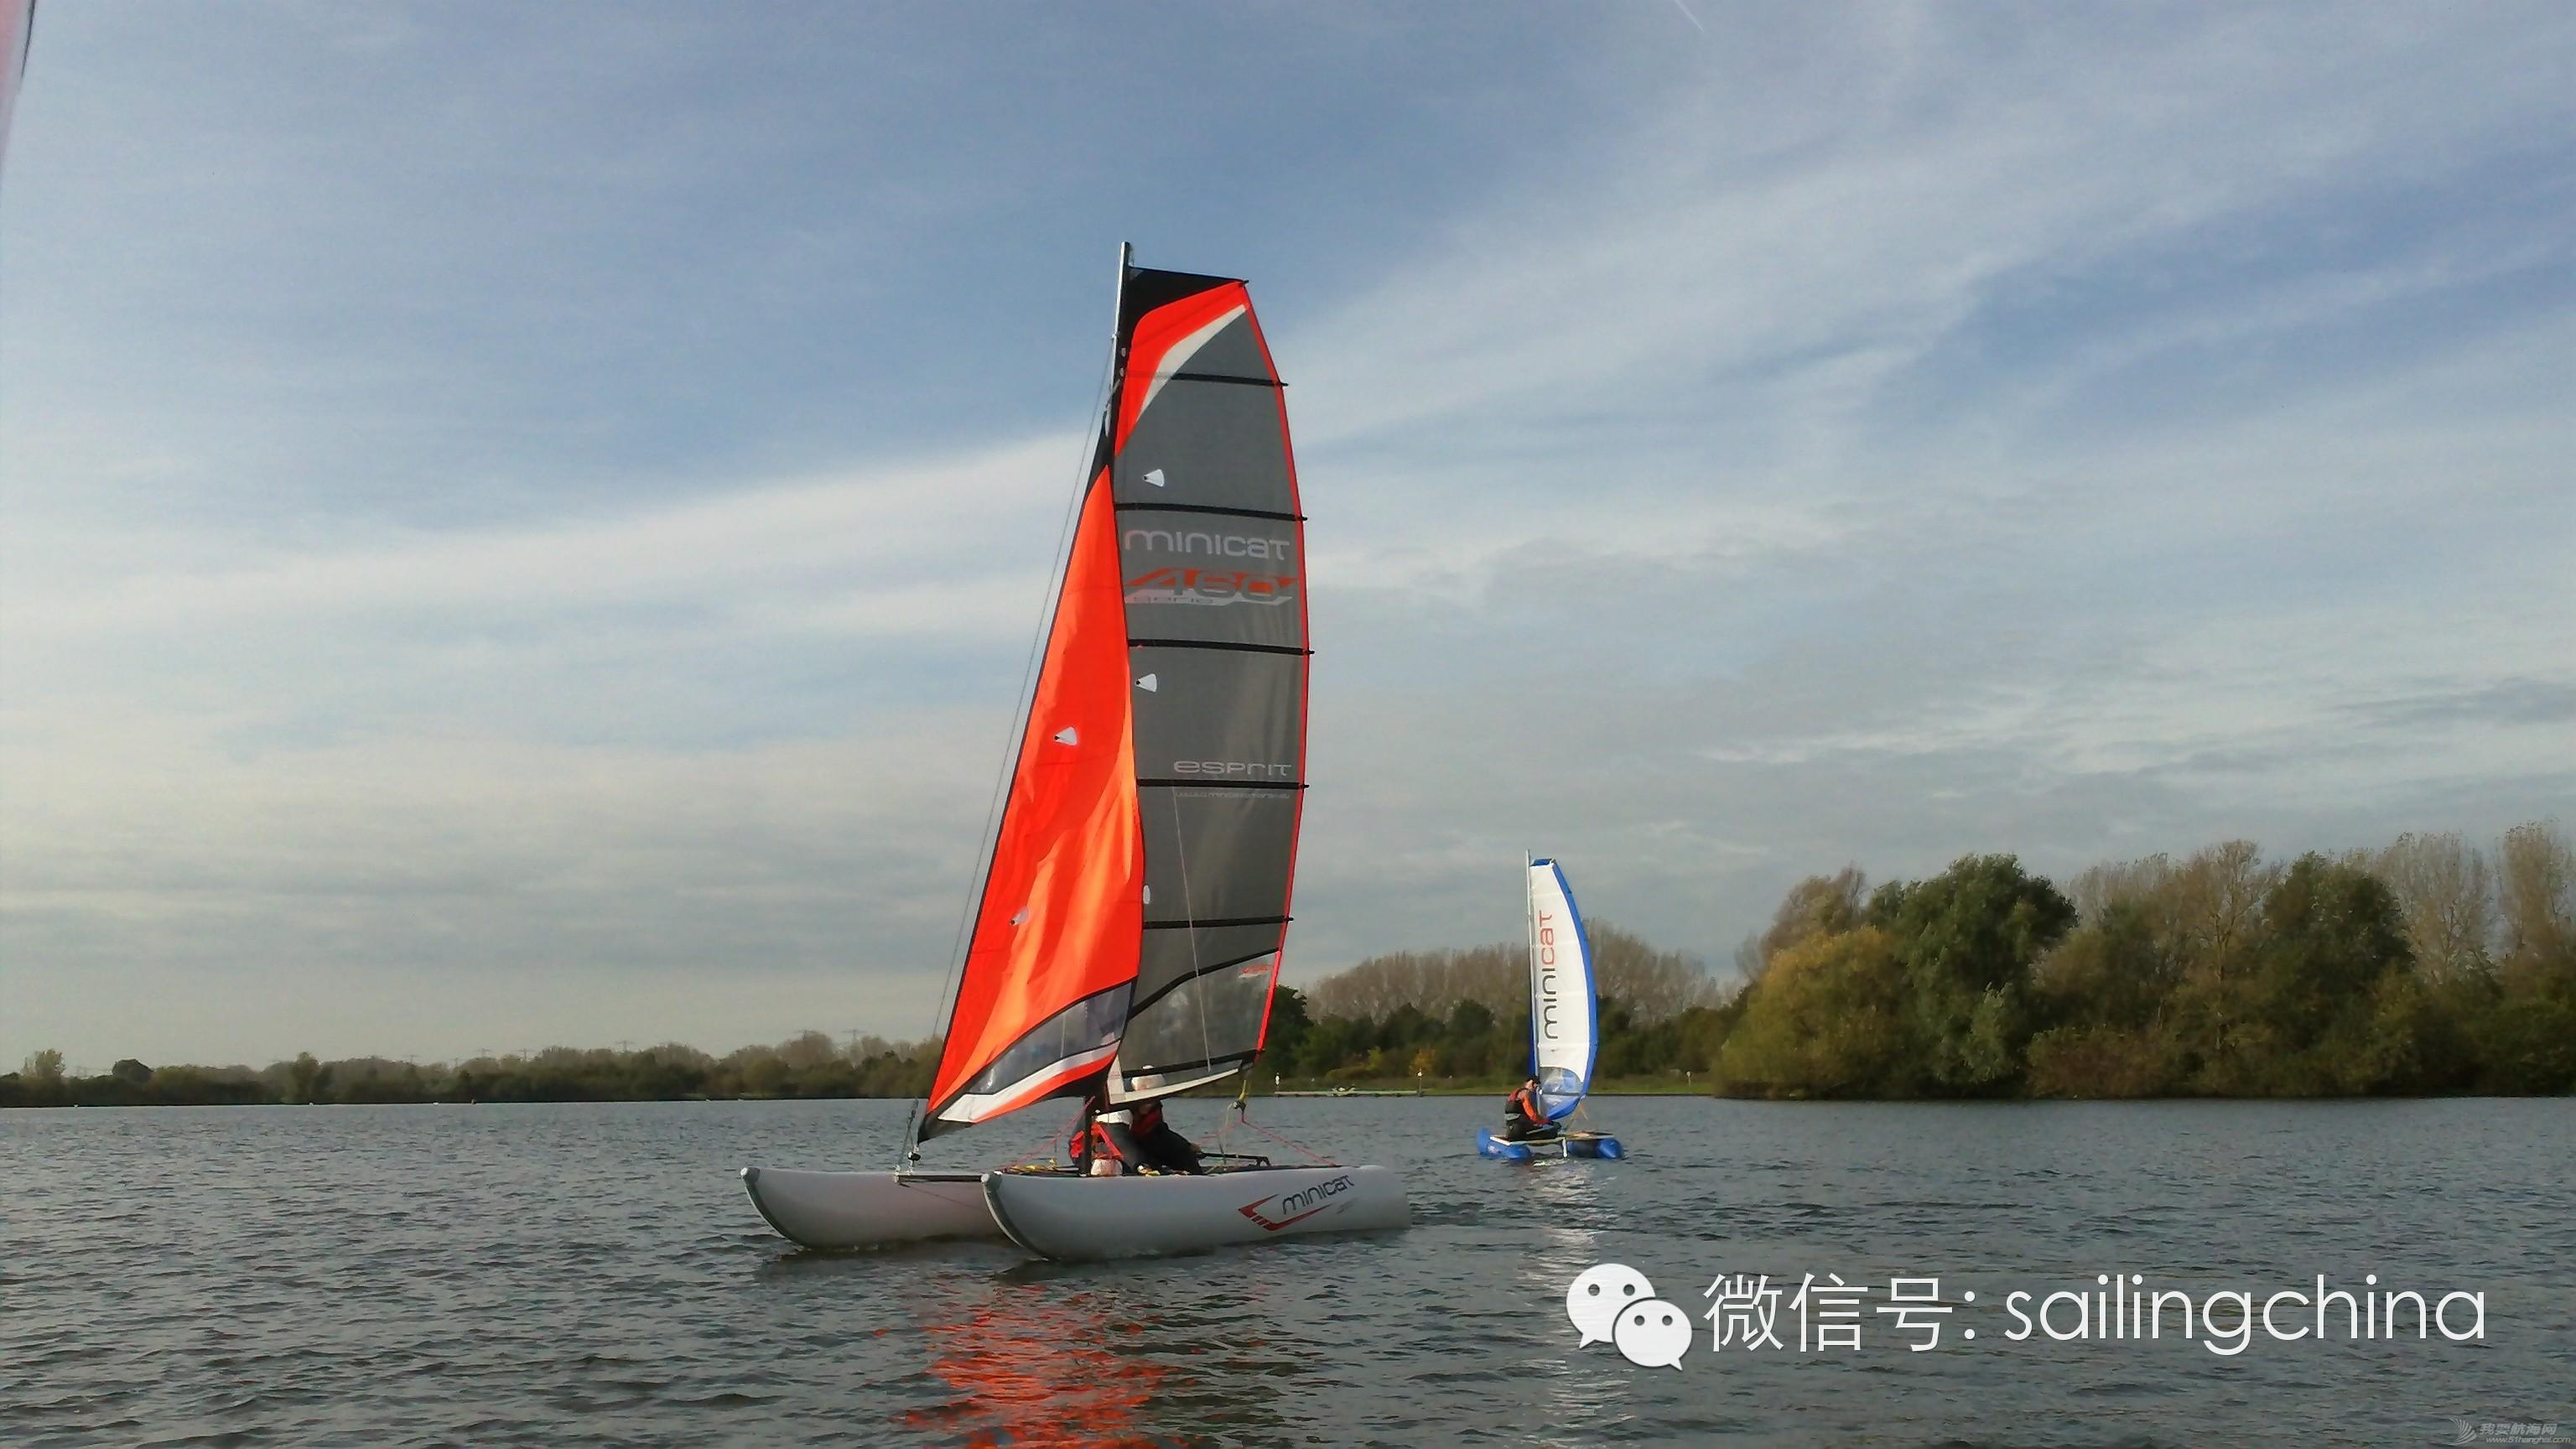 MINICAT充气式双体帆船--助你实现航海梦想 a6aaf52cb3dc51d937aee0da12edd7d7.jpg